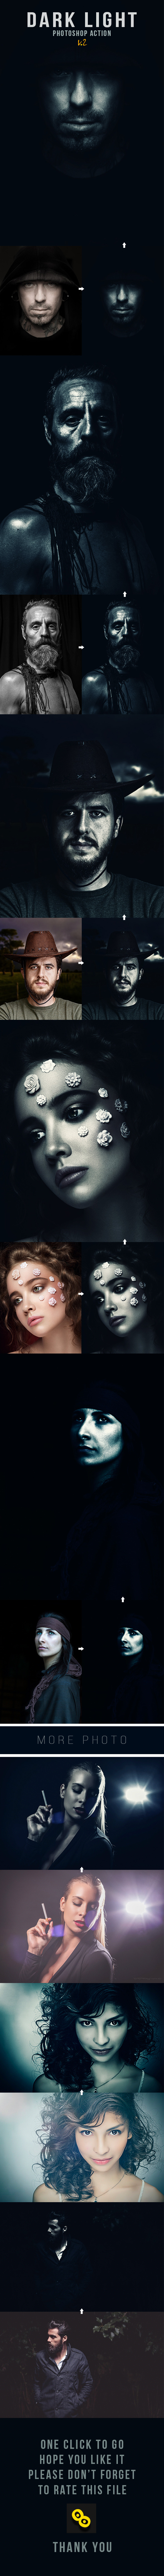 GraphicRiver Dark Light v-2 Photoshop Action 11213439